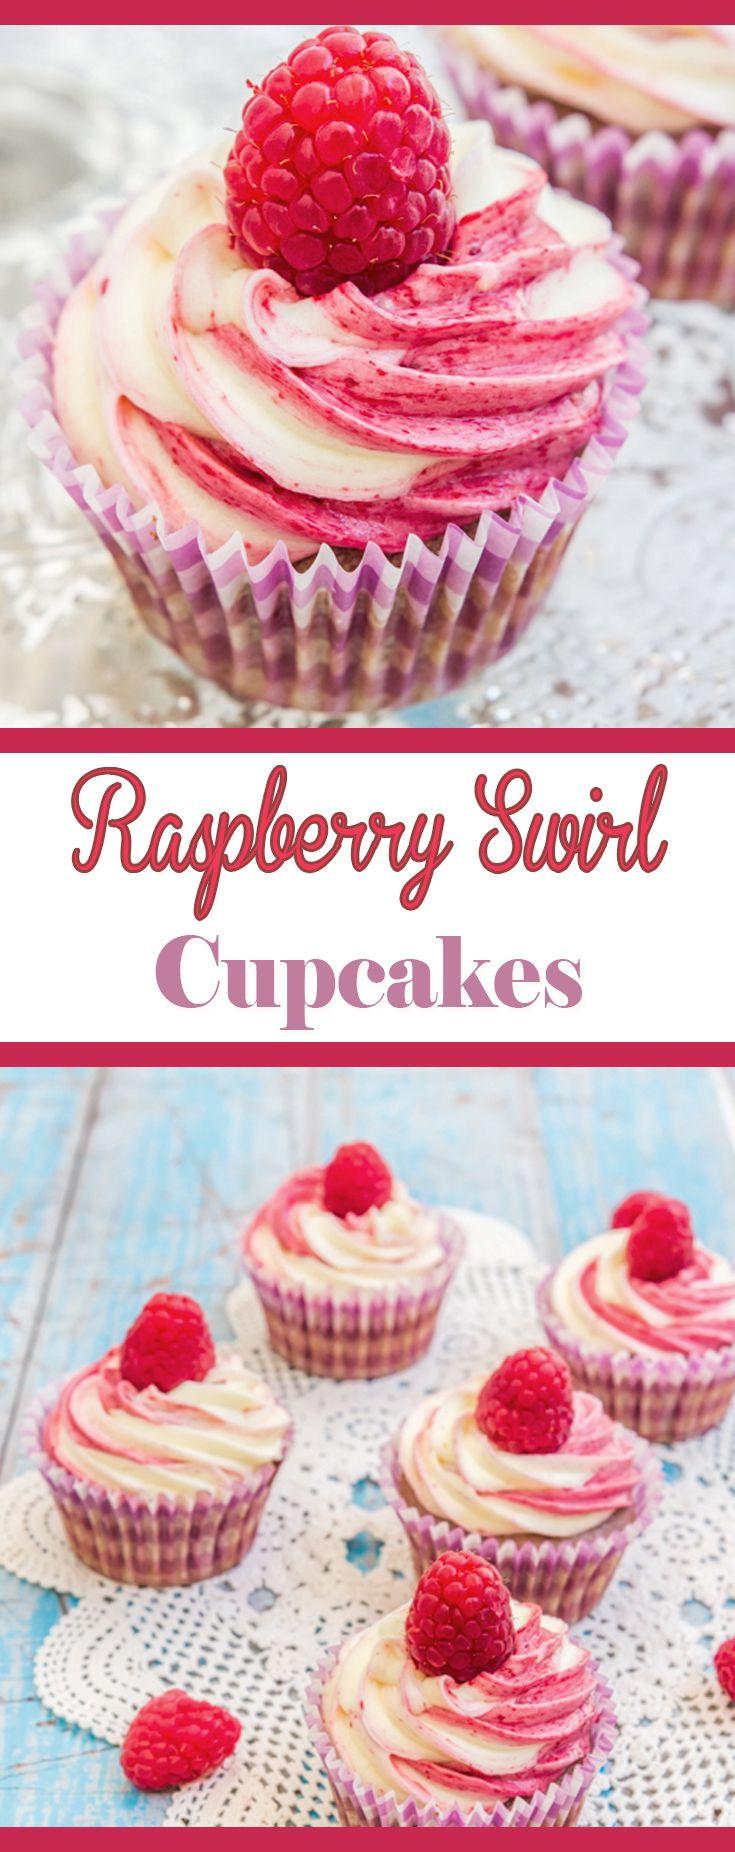 Raspberry Swirl Cupcakes